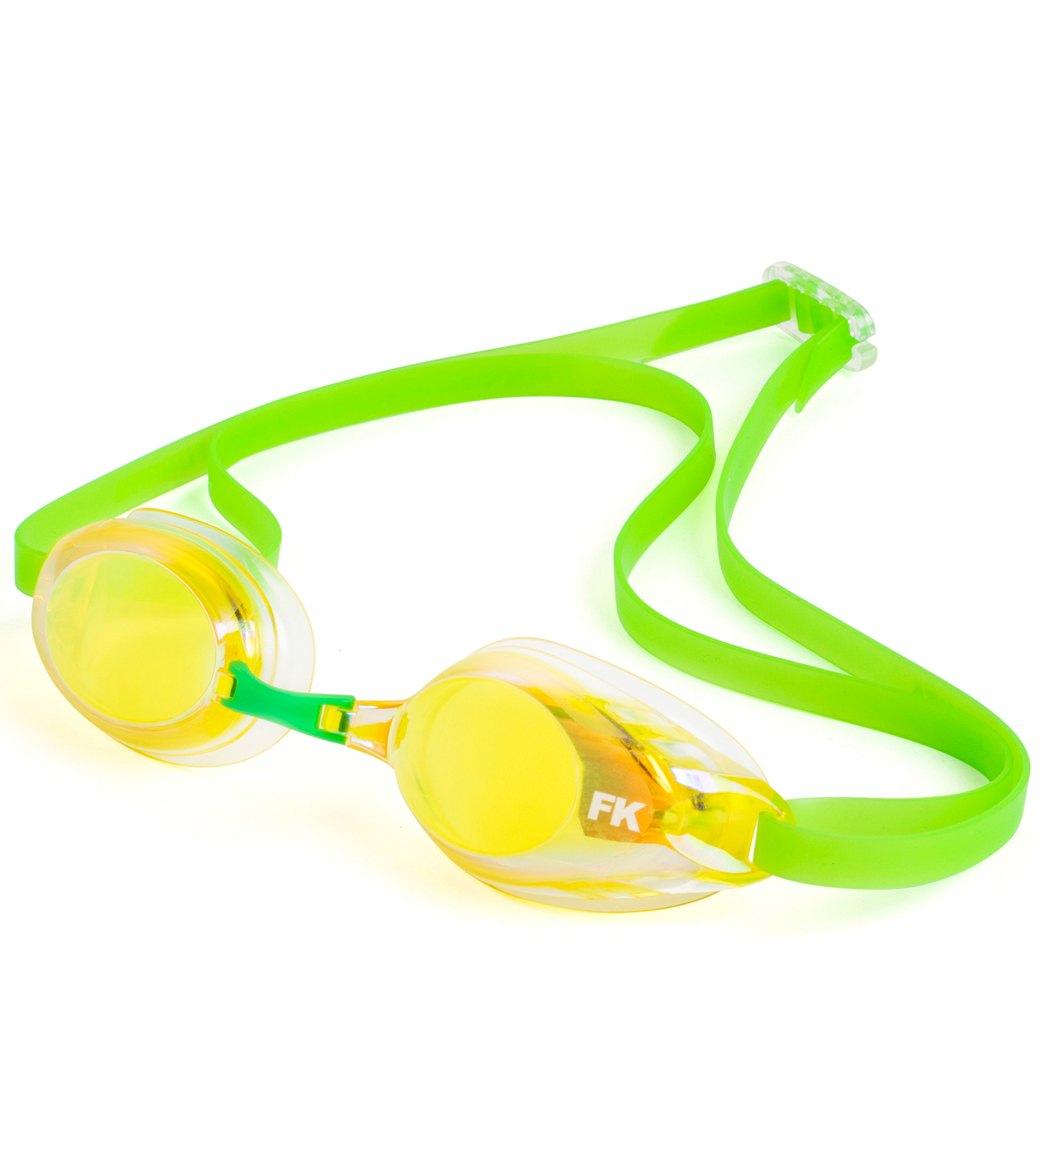 Funkita Slipstream Racer Swim Goggle At Swimoutlet Com